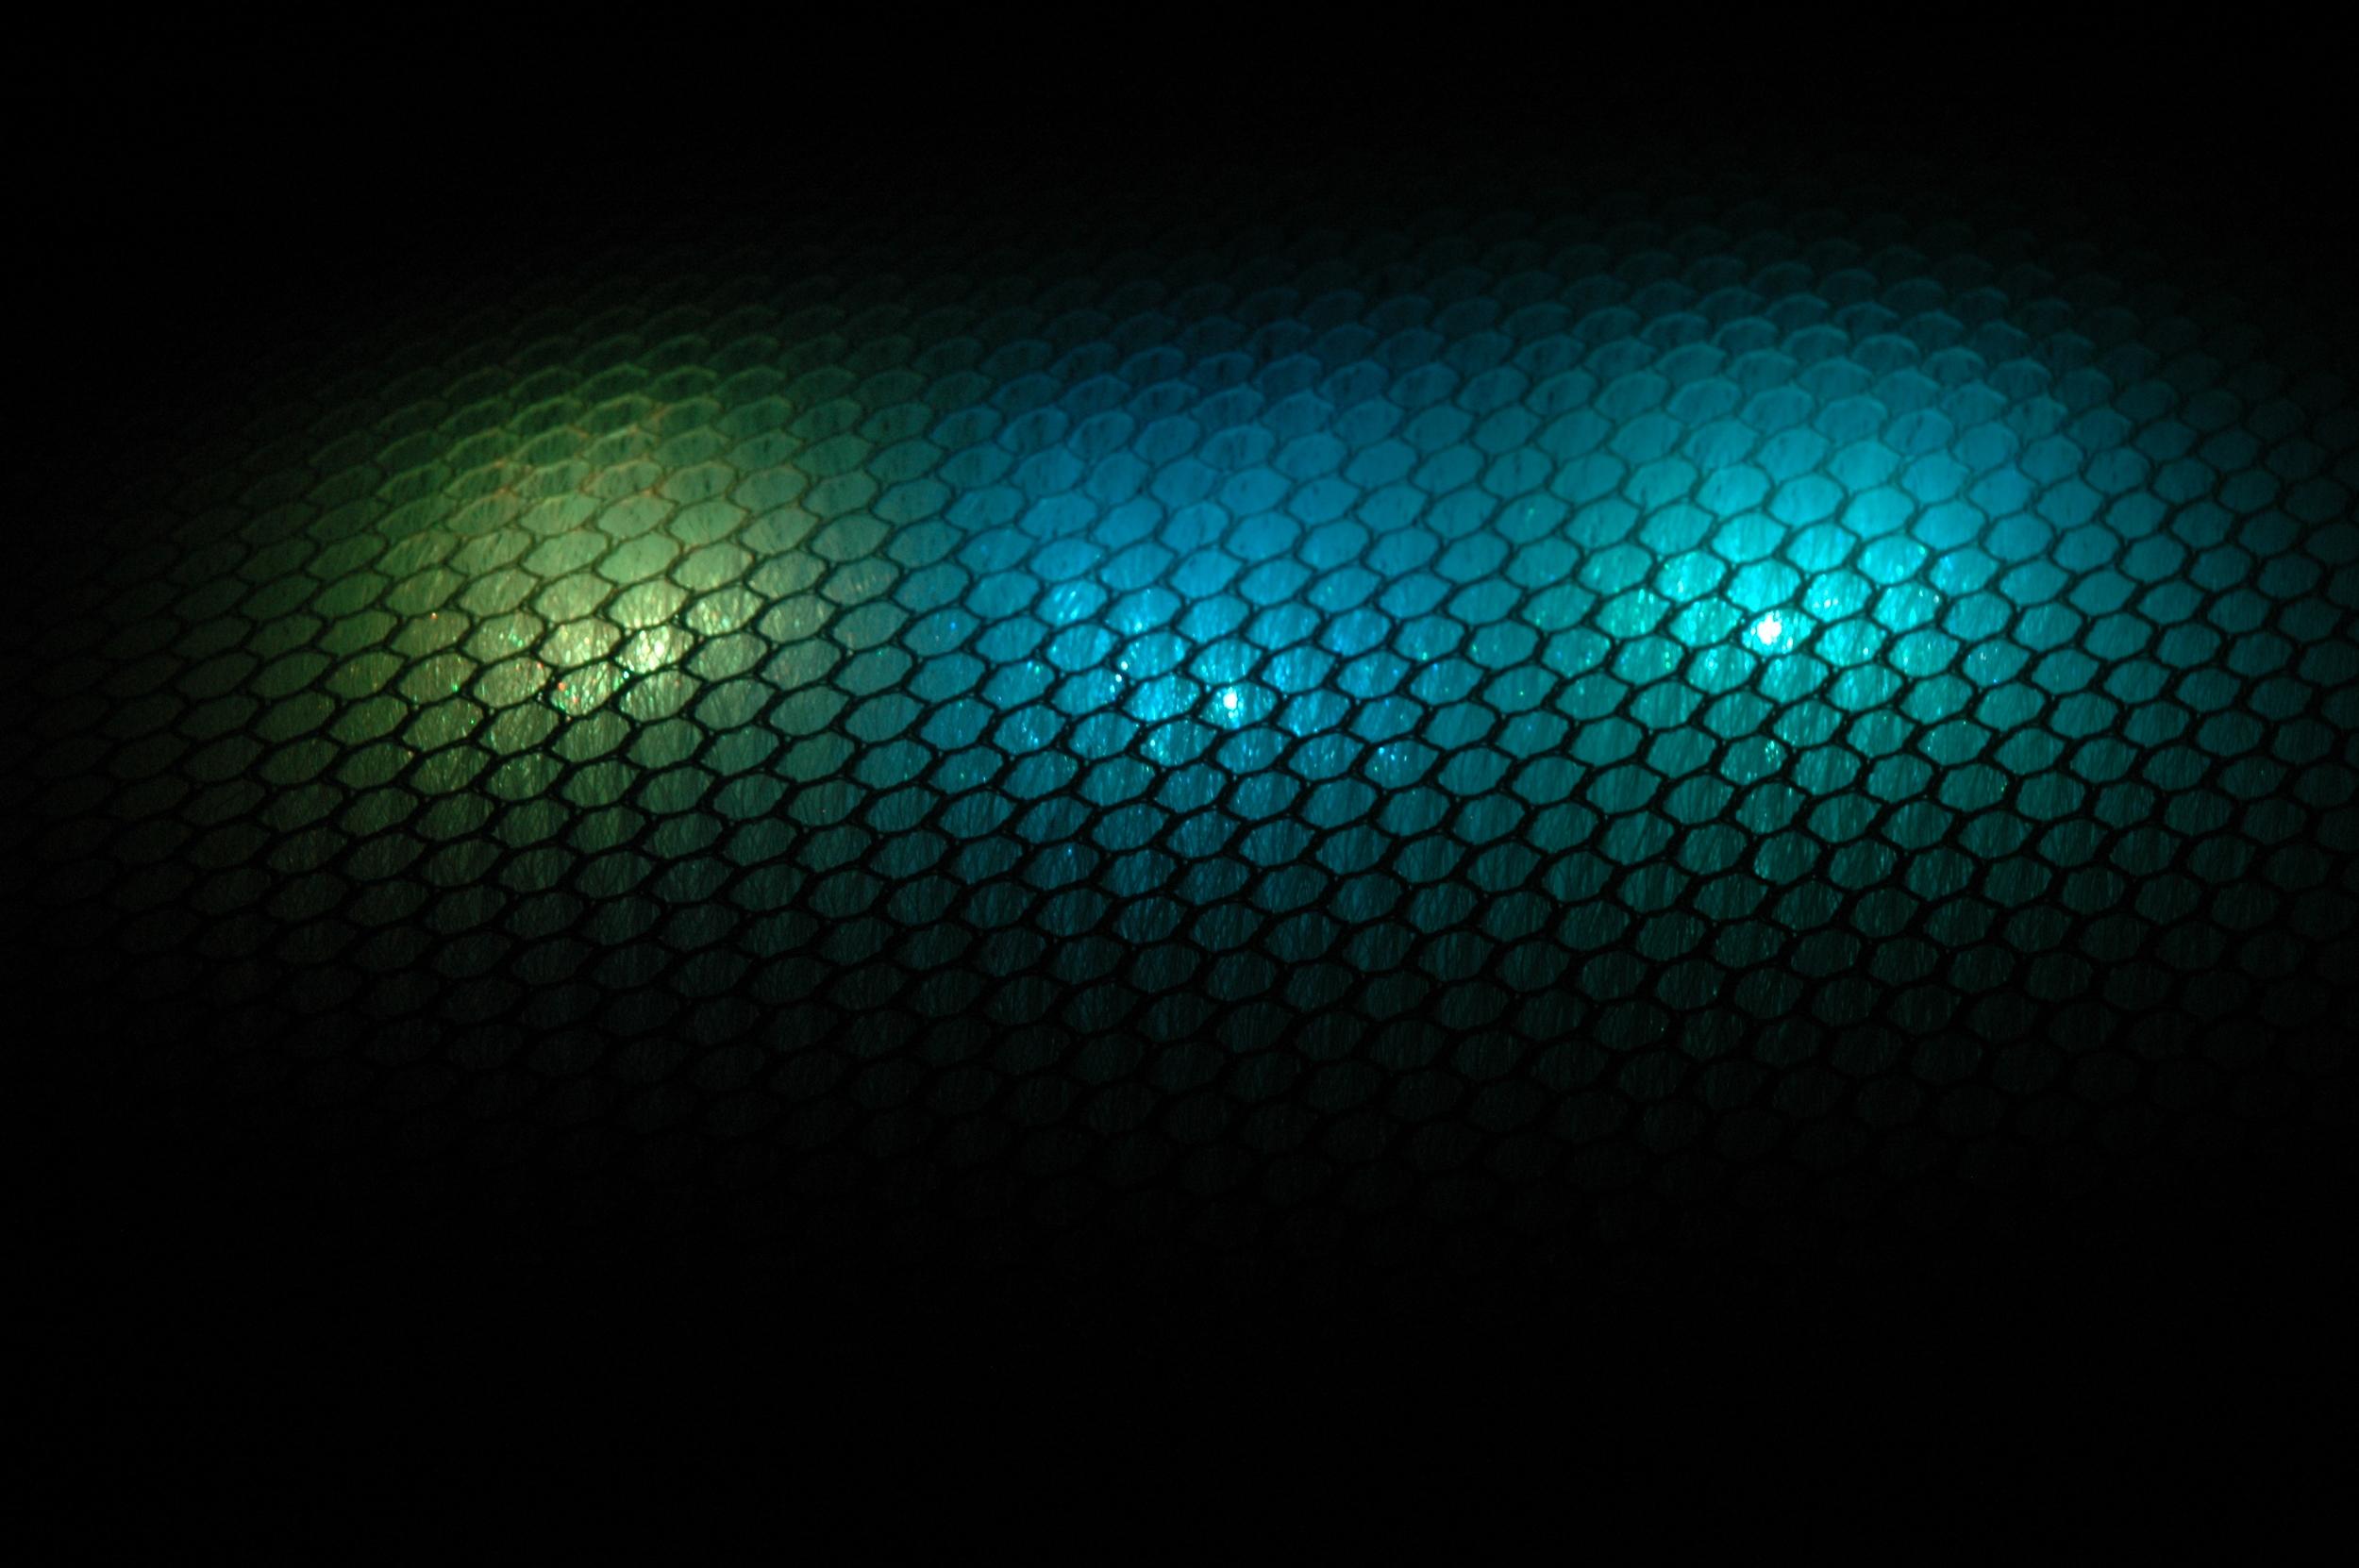 Light/Temperature Net Prototype